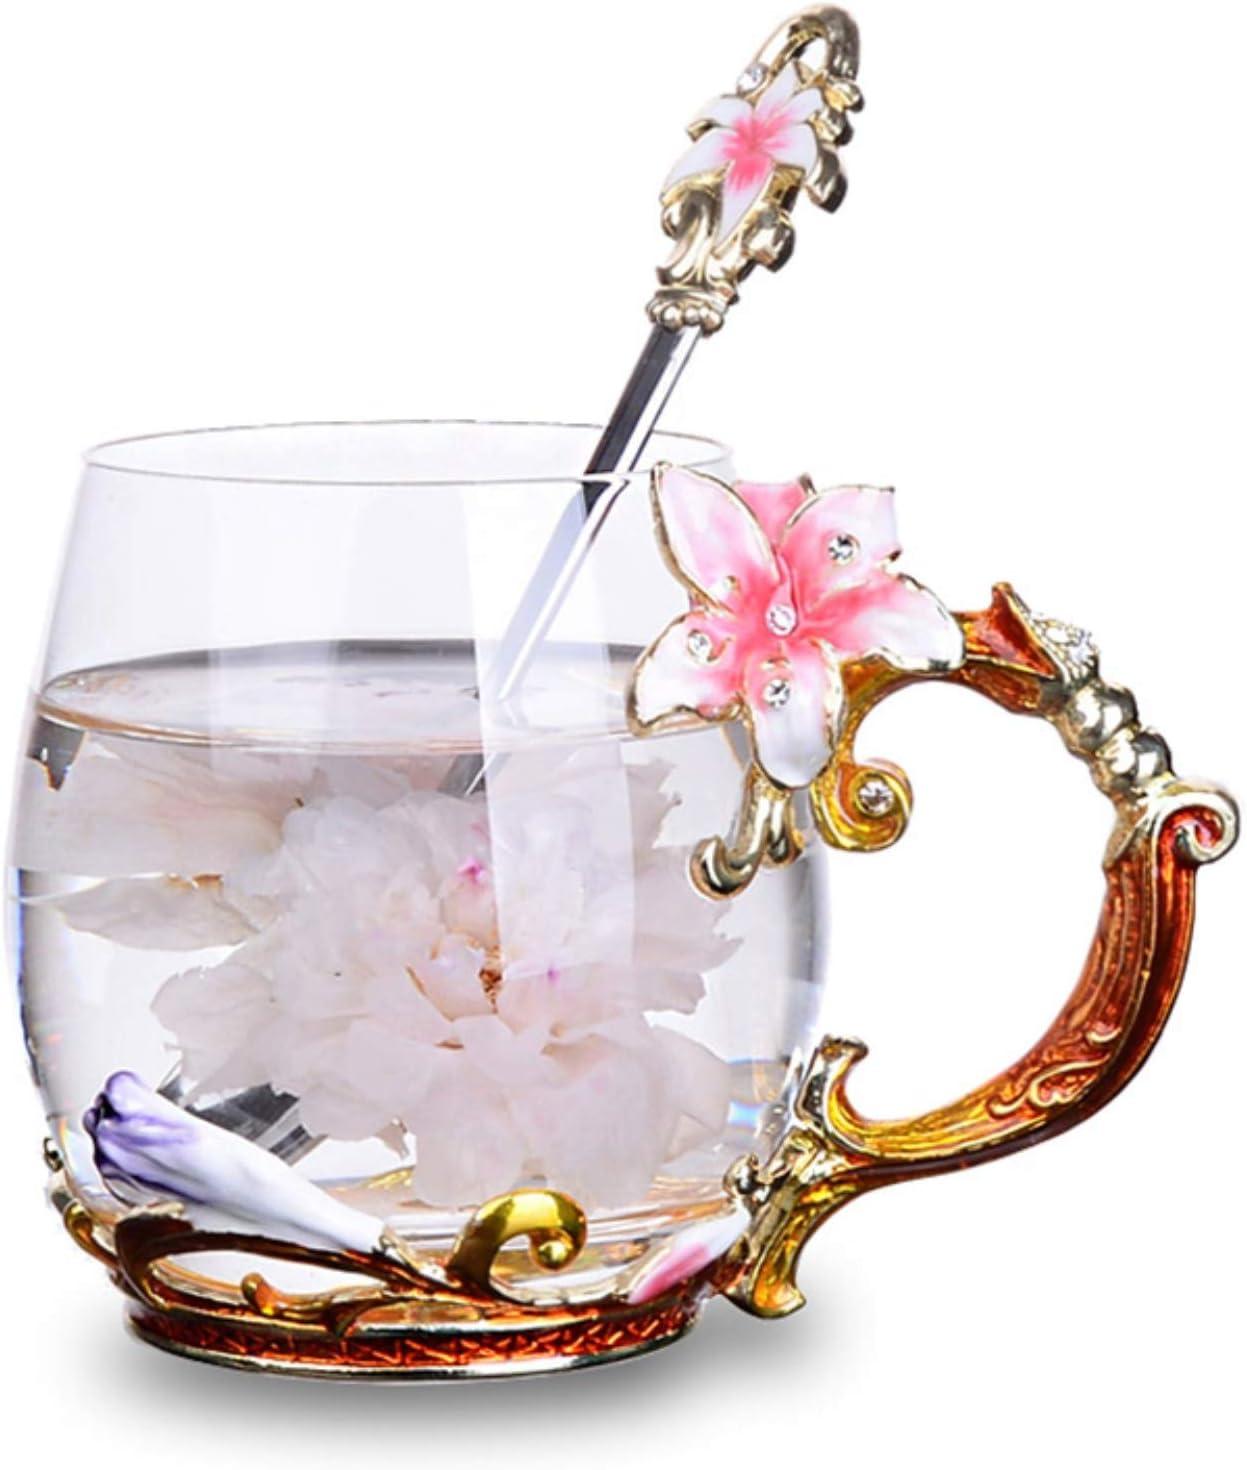 Tea Cup Coffee Mug Cups, Handmade Lily Flower Glass Coffee Cup 12 oz Ideal for Friend Wedding Anniversary Christmas Birthday Presents(Pink)